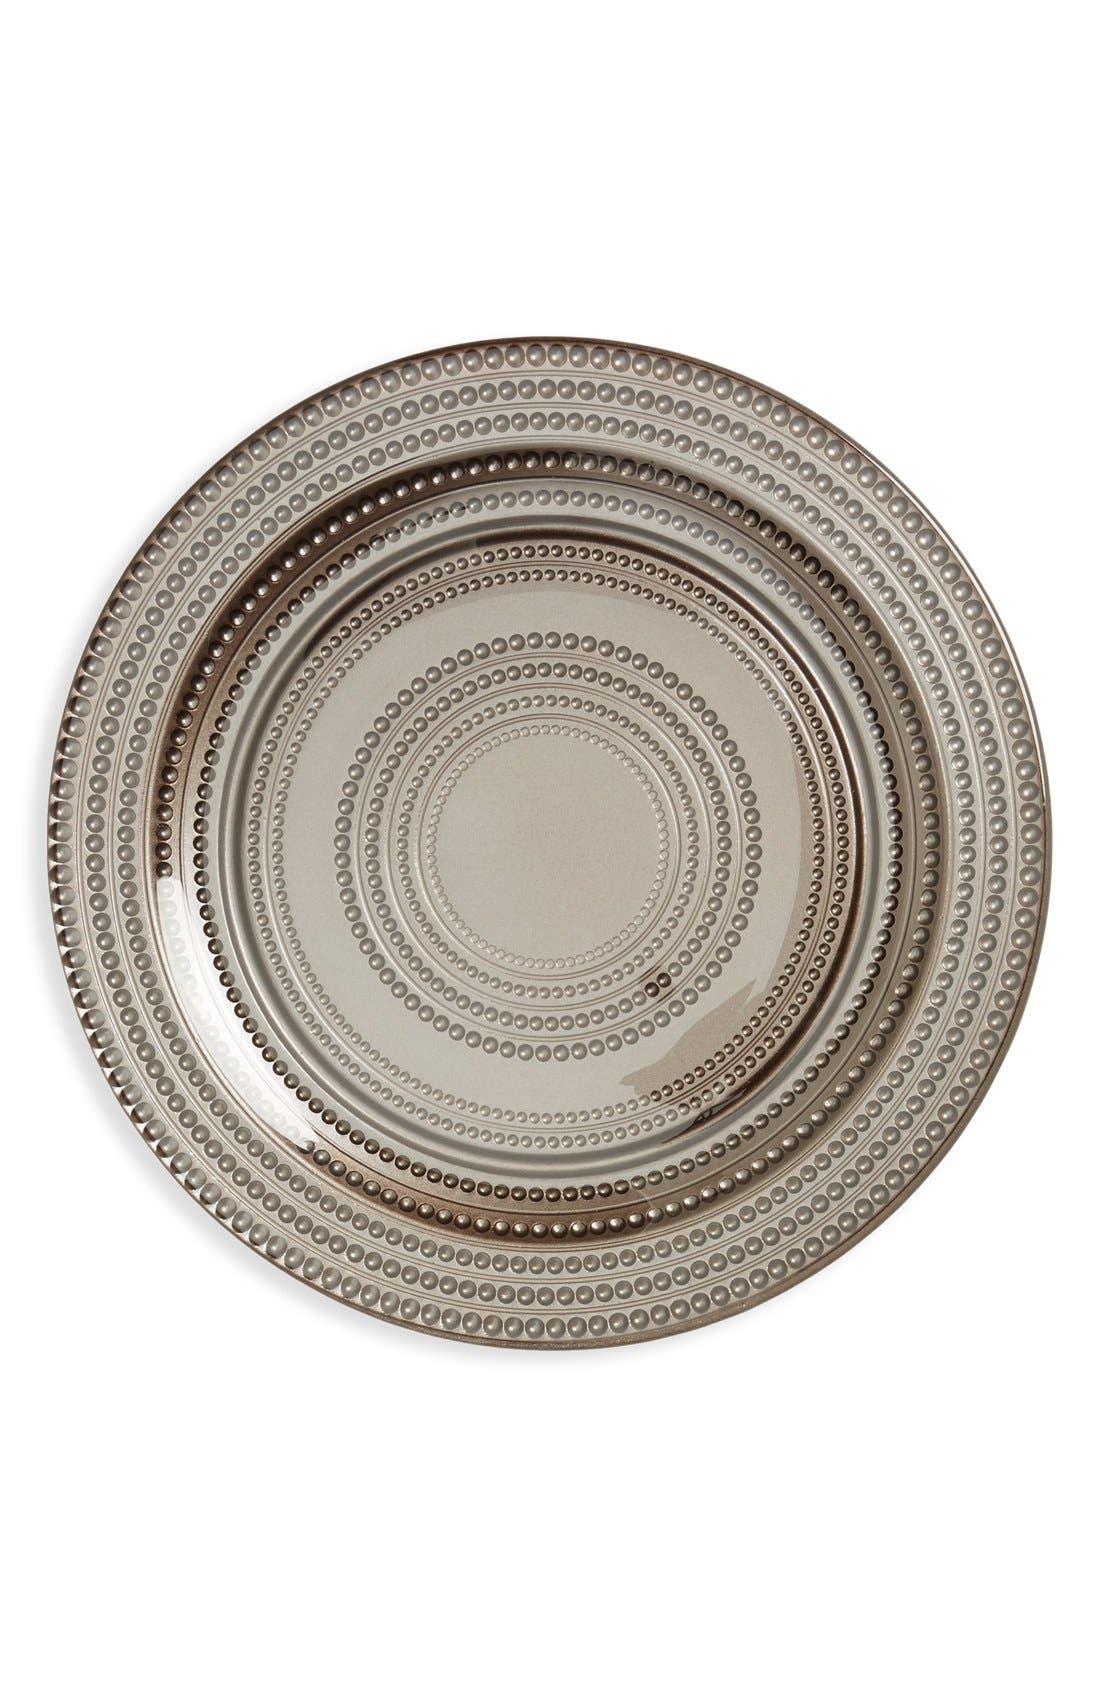 Alternate Image 1 Selected - Europe2You Beaded Glass Dinner Plate